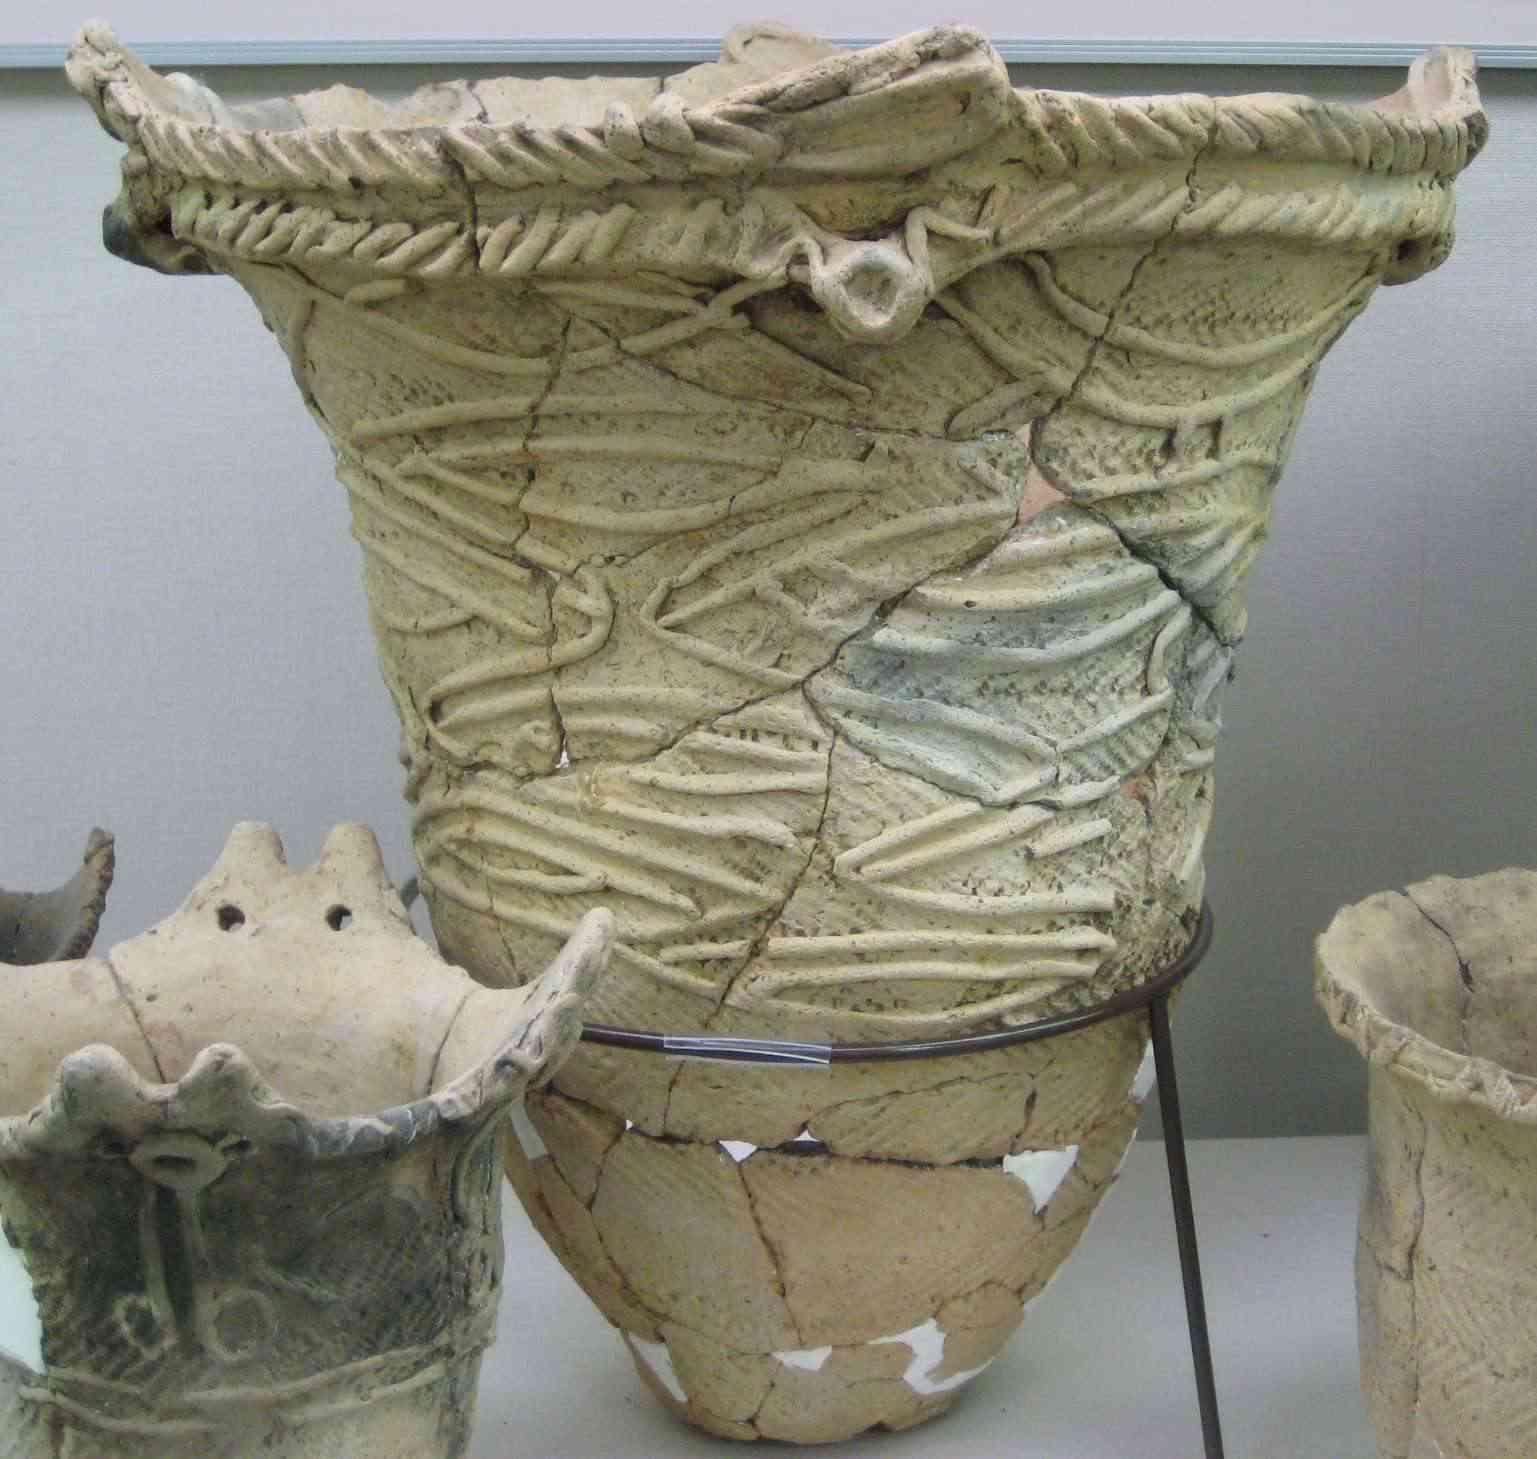 Applique Pot, Middle Jomon, Sannai Maruyama Site